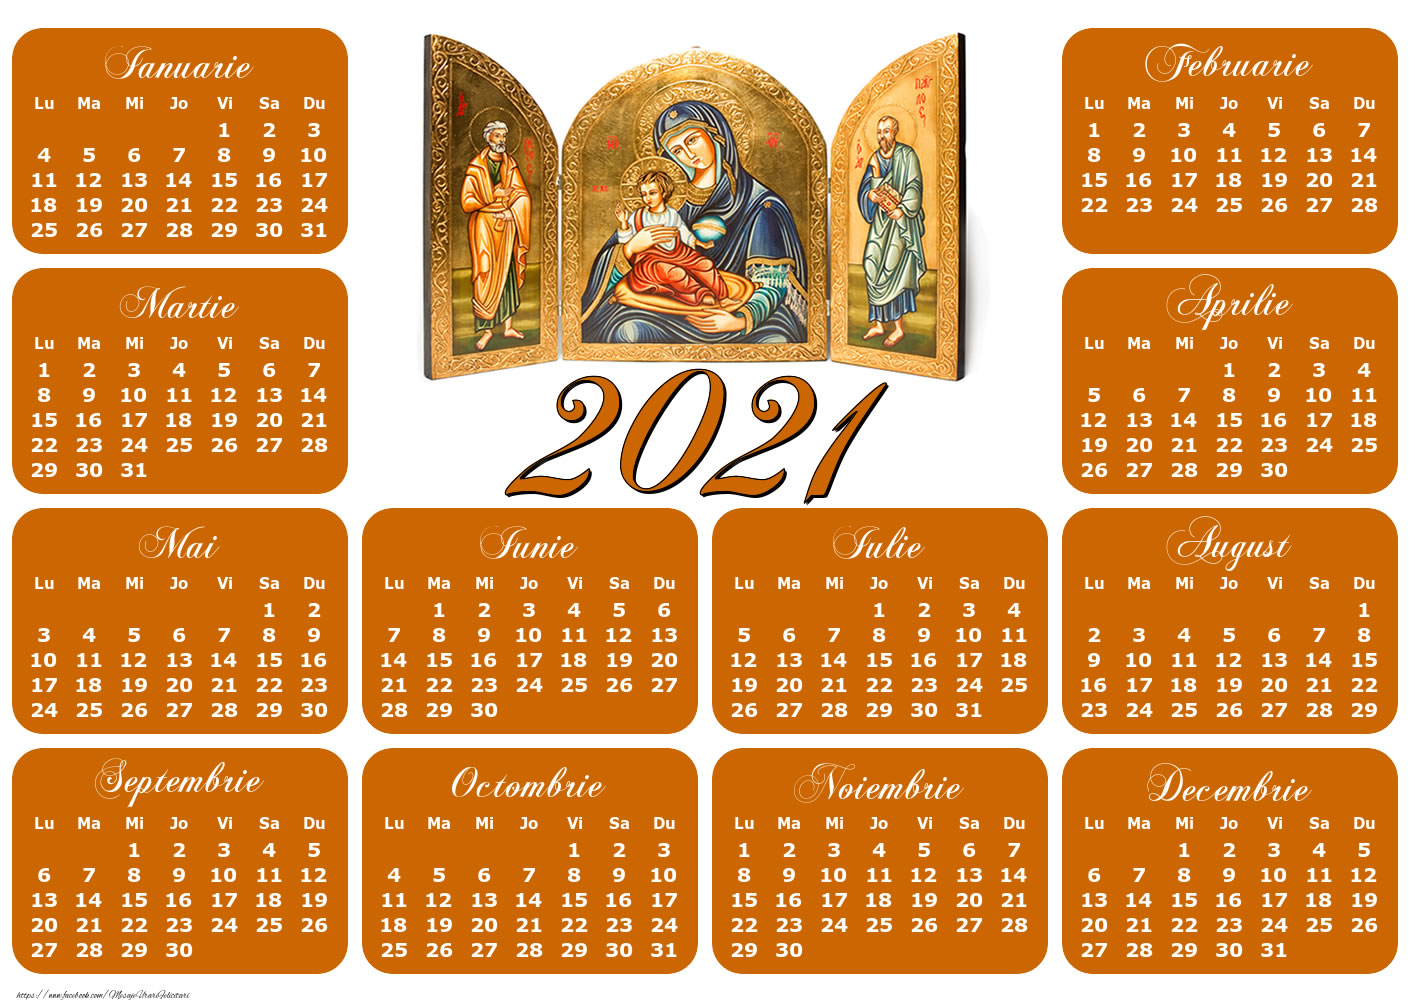 Imagini cu calendare - Calendar Icoane - Model 1